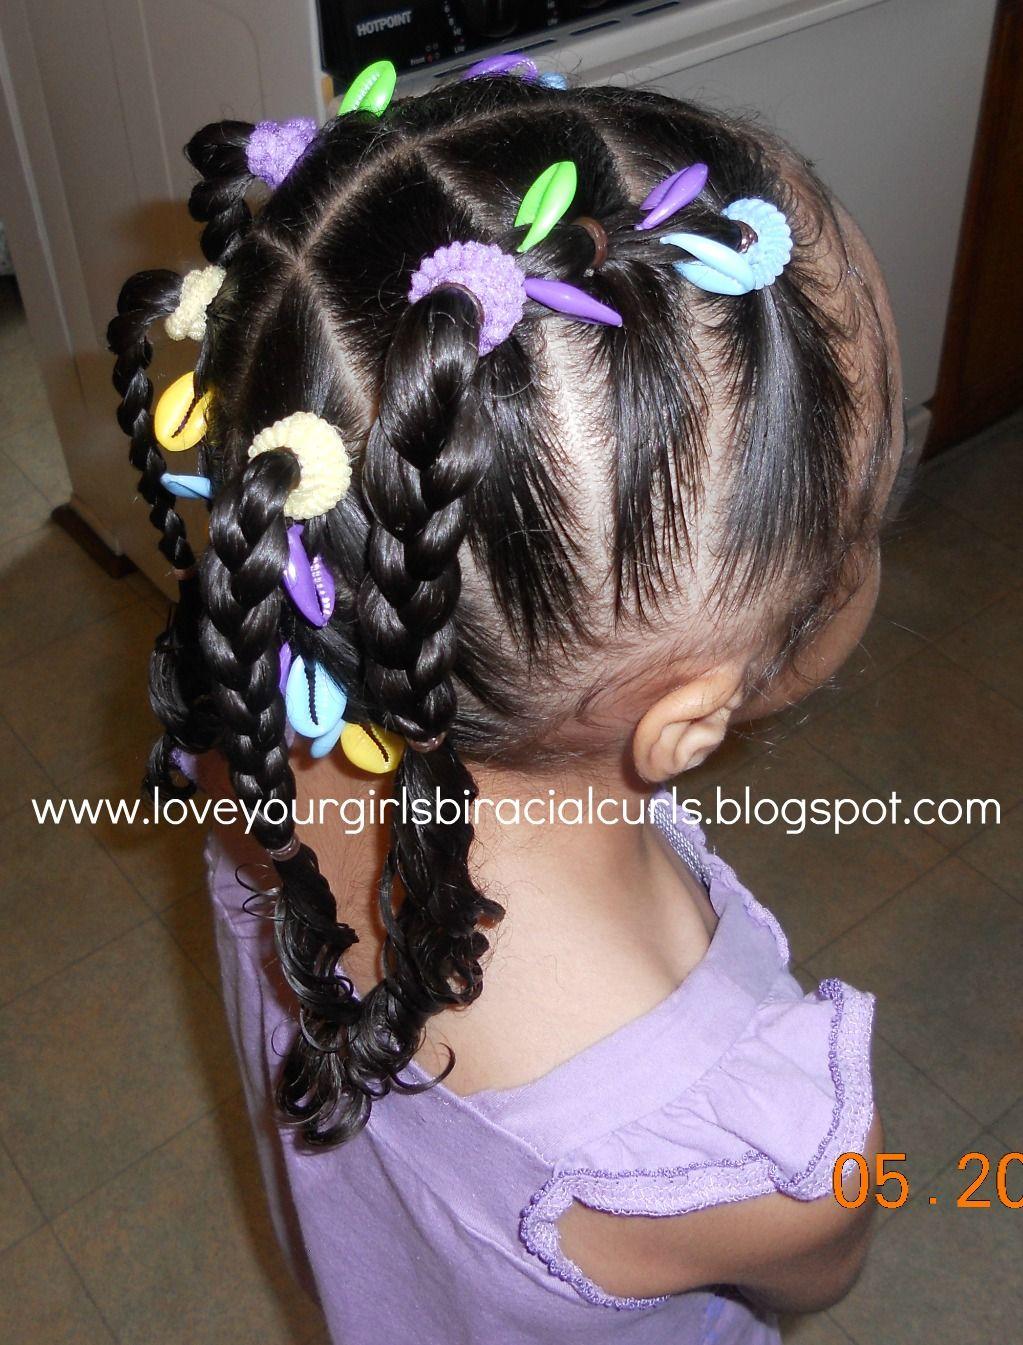 love your girls biracial curls: diva r's little mermaid inspired